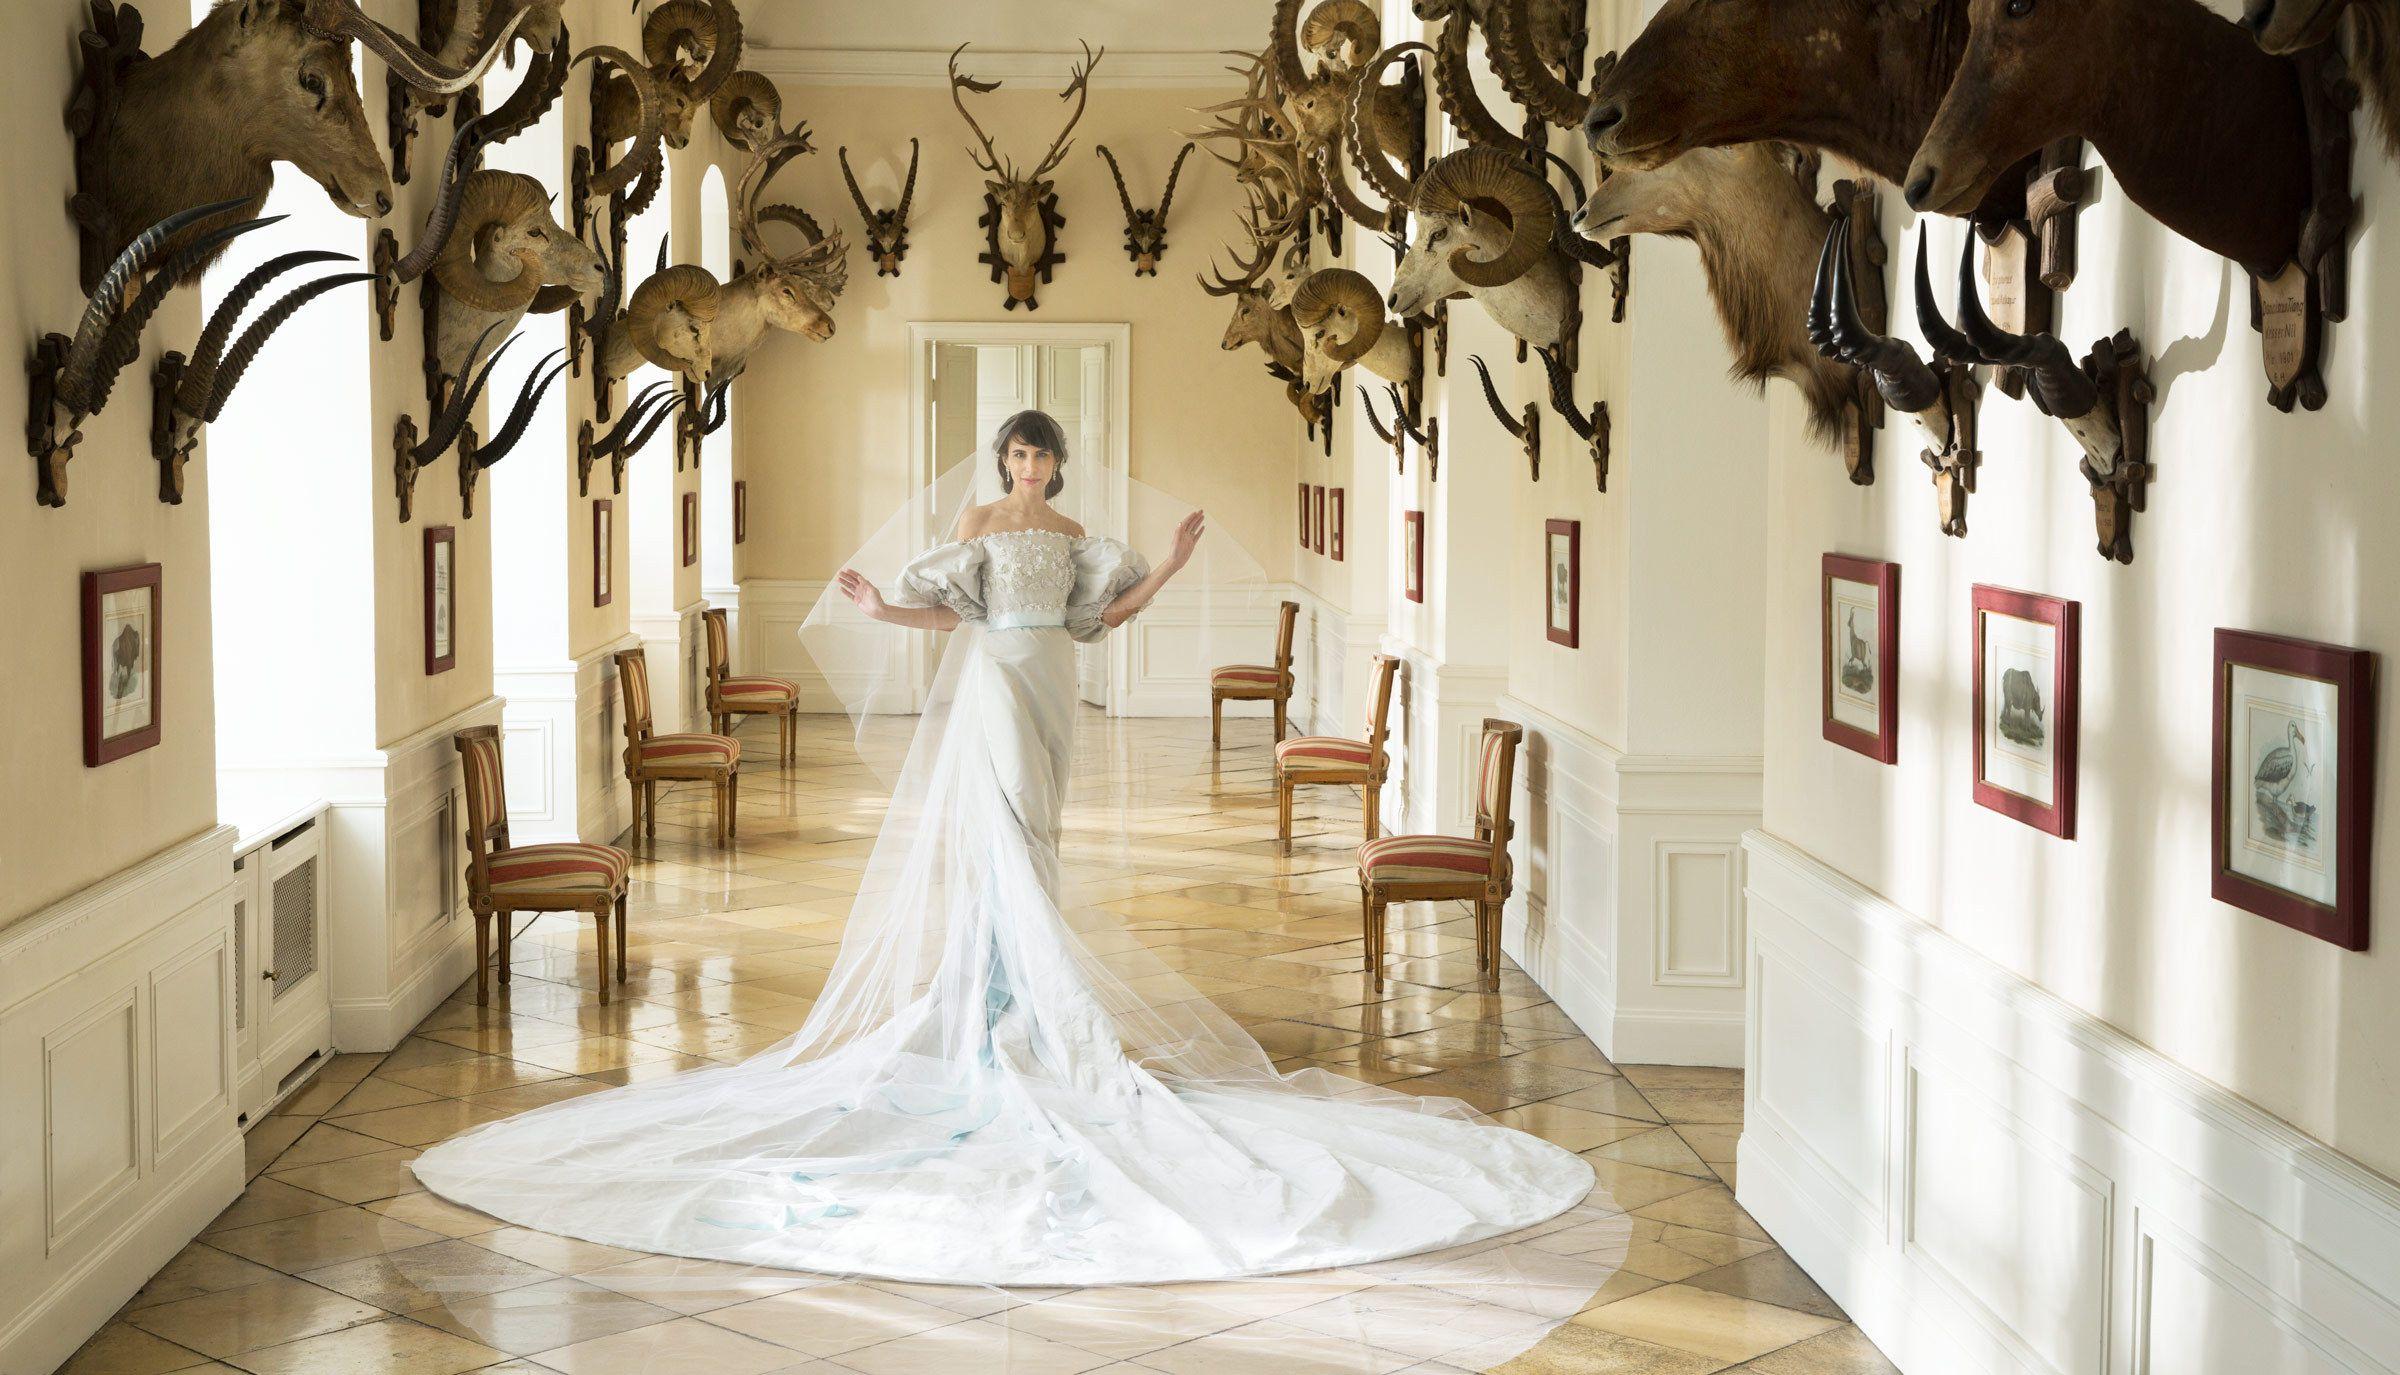 1r13_07_11_vogue_usa_sieber_von_westenholz_wedding_0195_comp_jr_flt_v2_resized